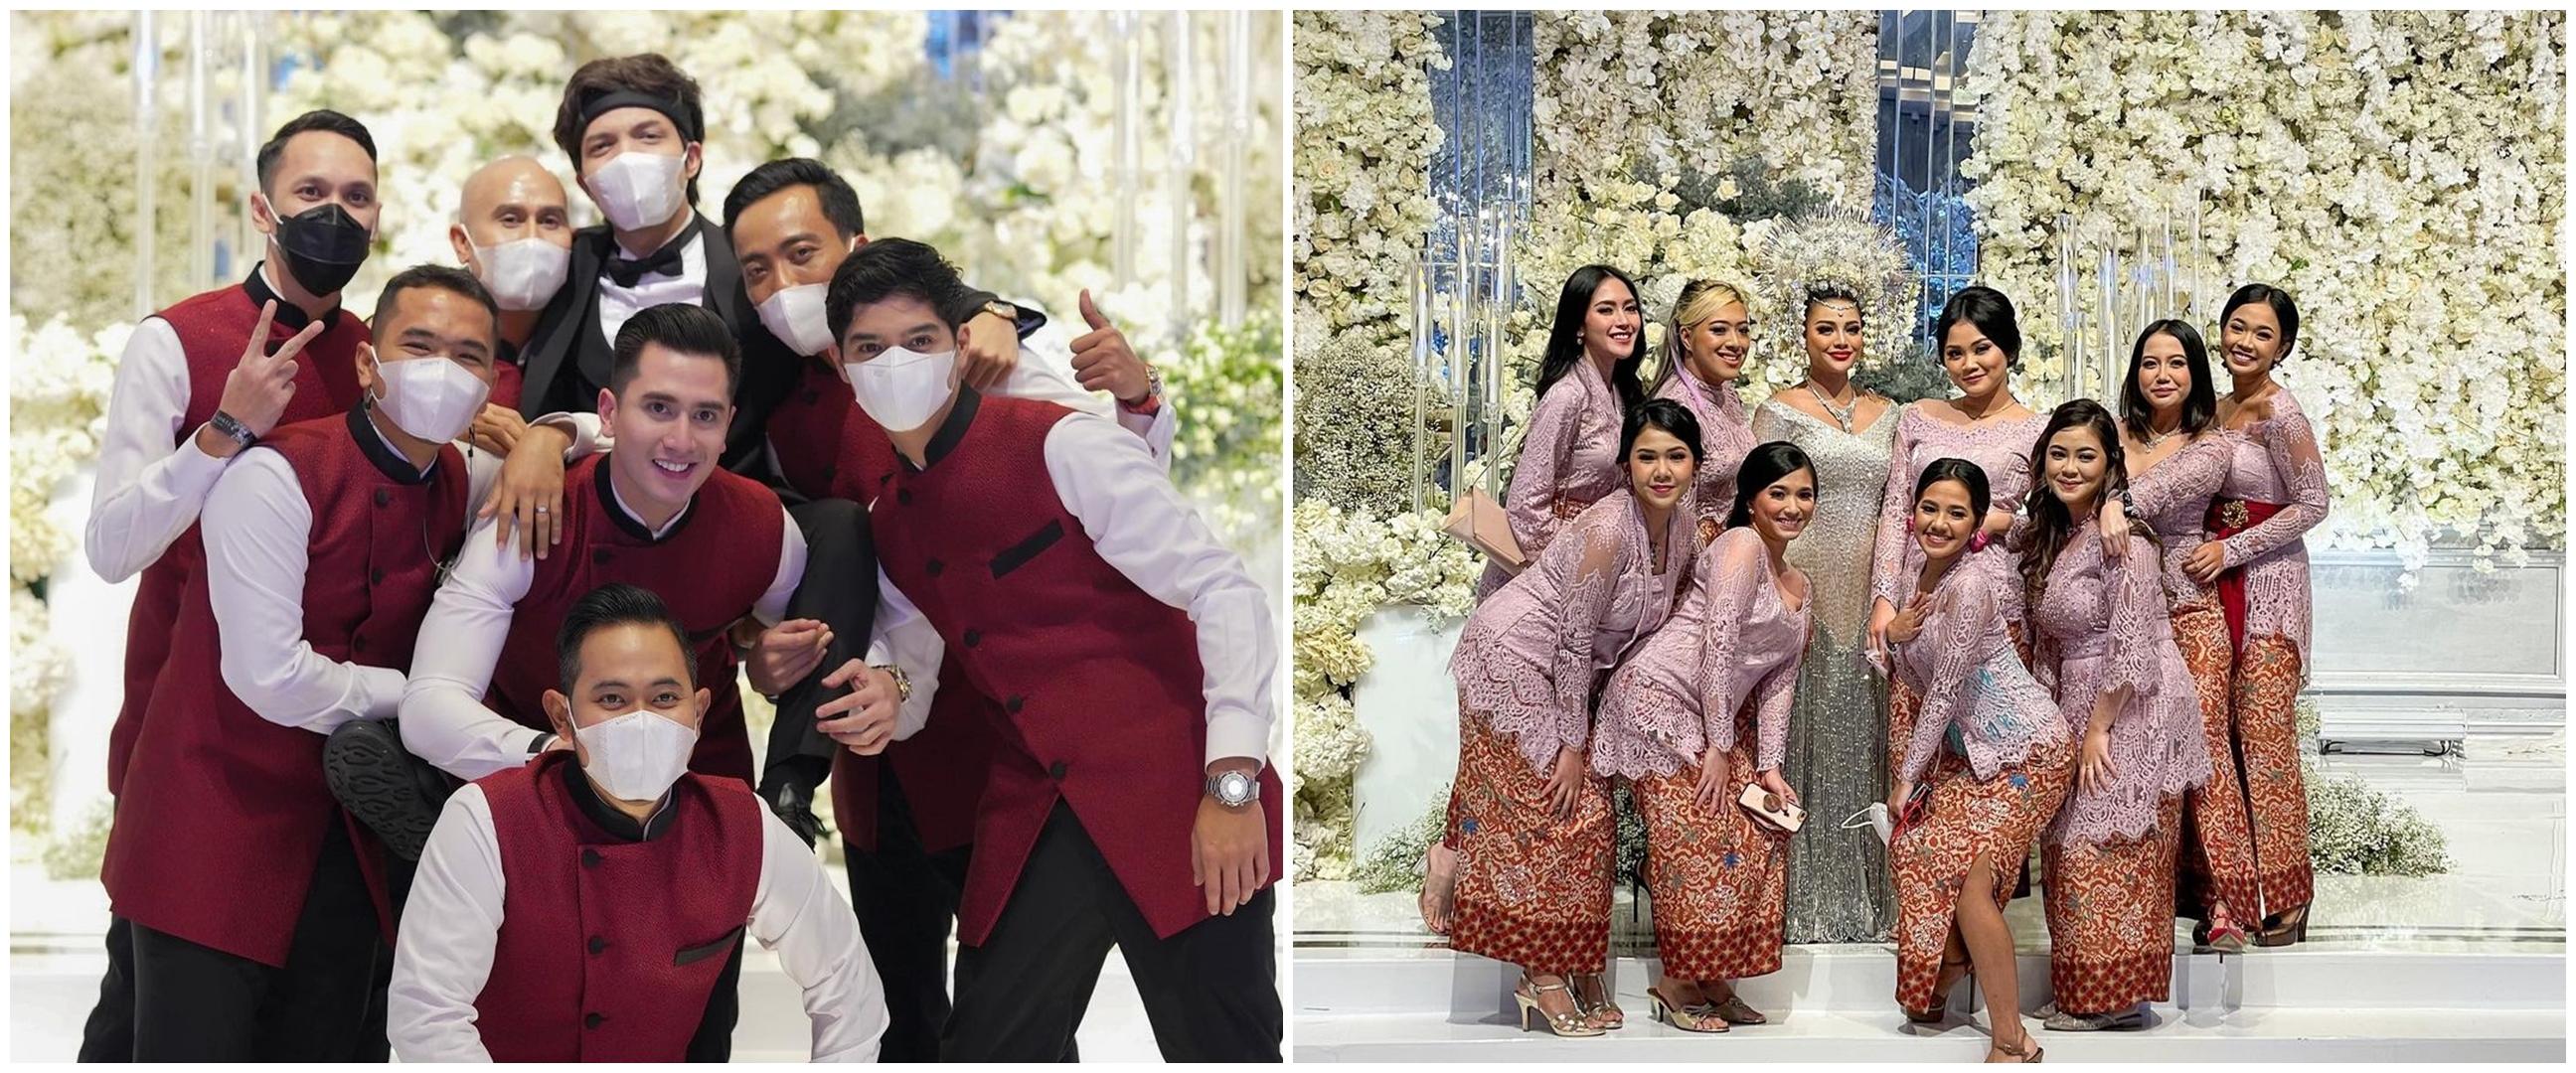 8 Potret bridesmaid dan groomsmen Atta dan Aurel, gayanya kece pol